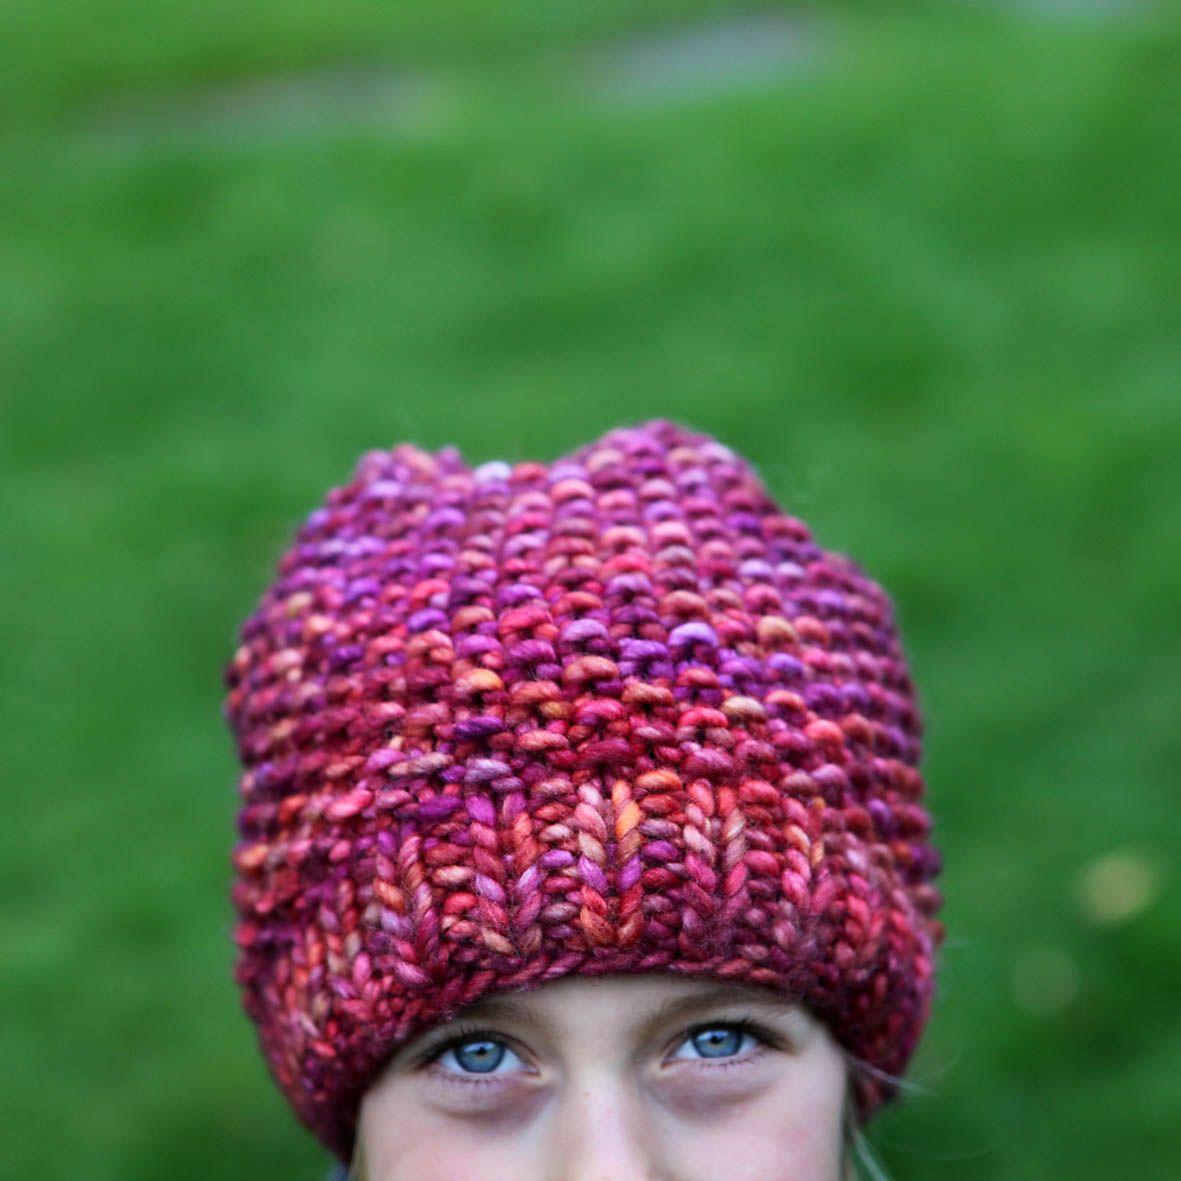 Malabrigo rasta archangel moss stitch hat for kids and adults malabrigo rasta archangel moss stitch hat for kids and adults free pattern on bankloansurffo Image collections